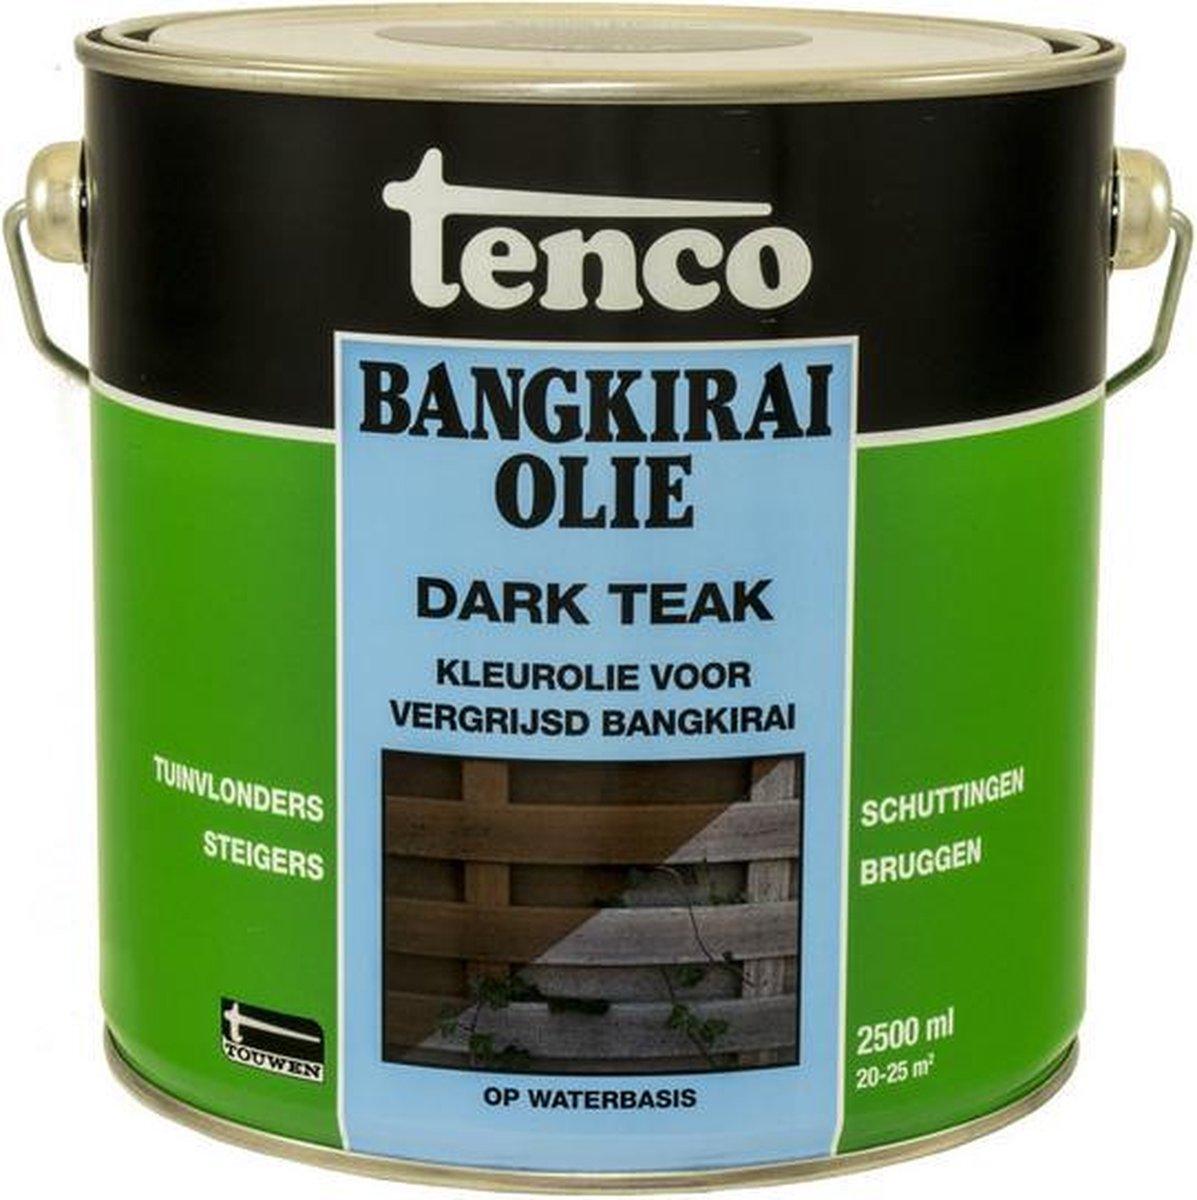 Tenco Bangkirai Olie Dark Teak 2,5 l